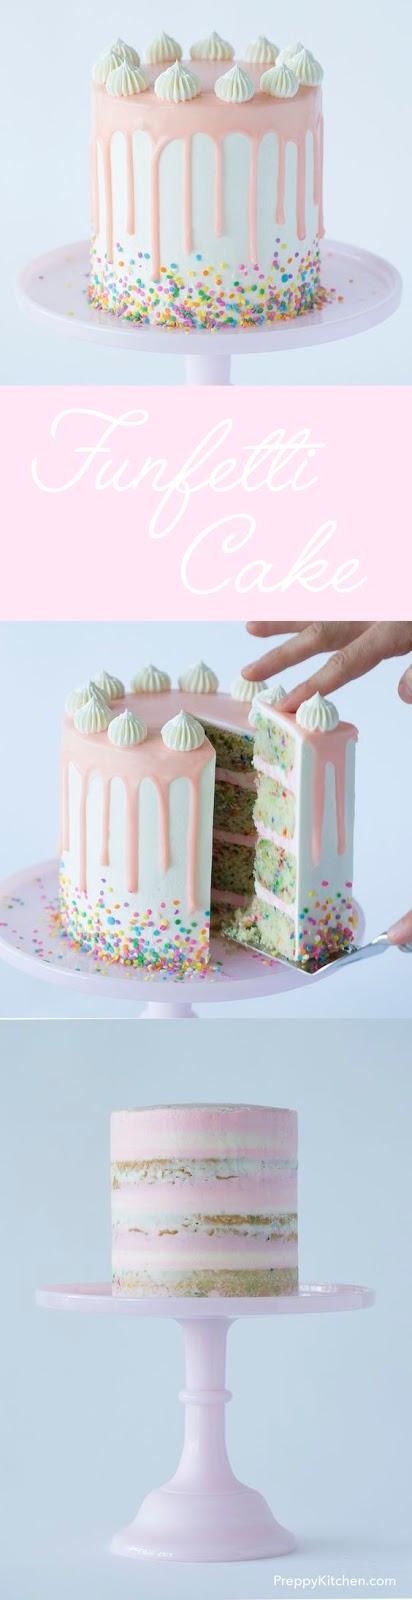 Funfettí Cake